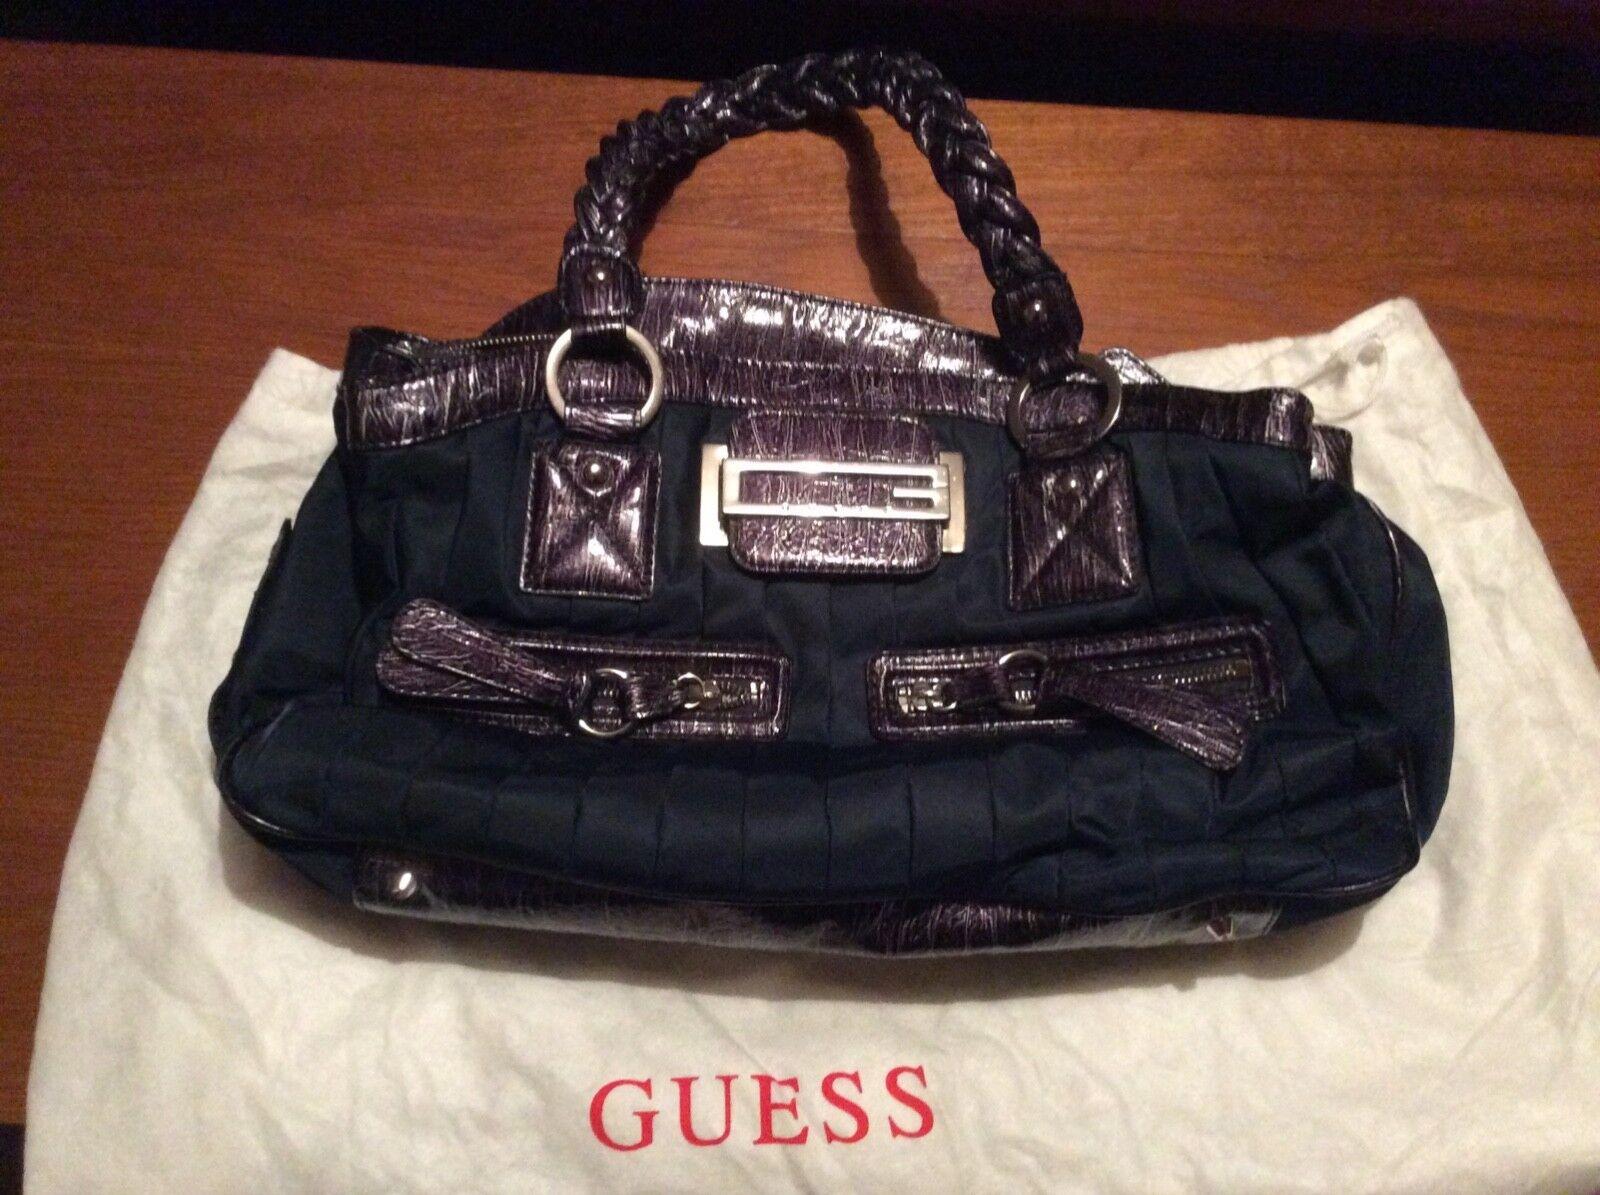 4fb7d28ecc8f3 Shopping Bag GUESS Vikky With Clutch Bag Vg6995230 Navy for sale ...